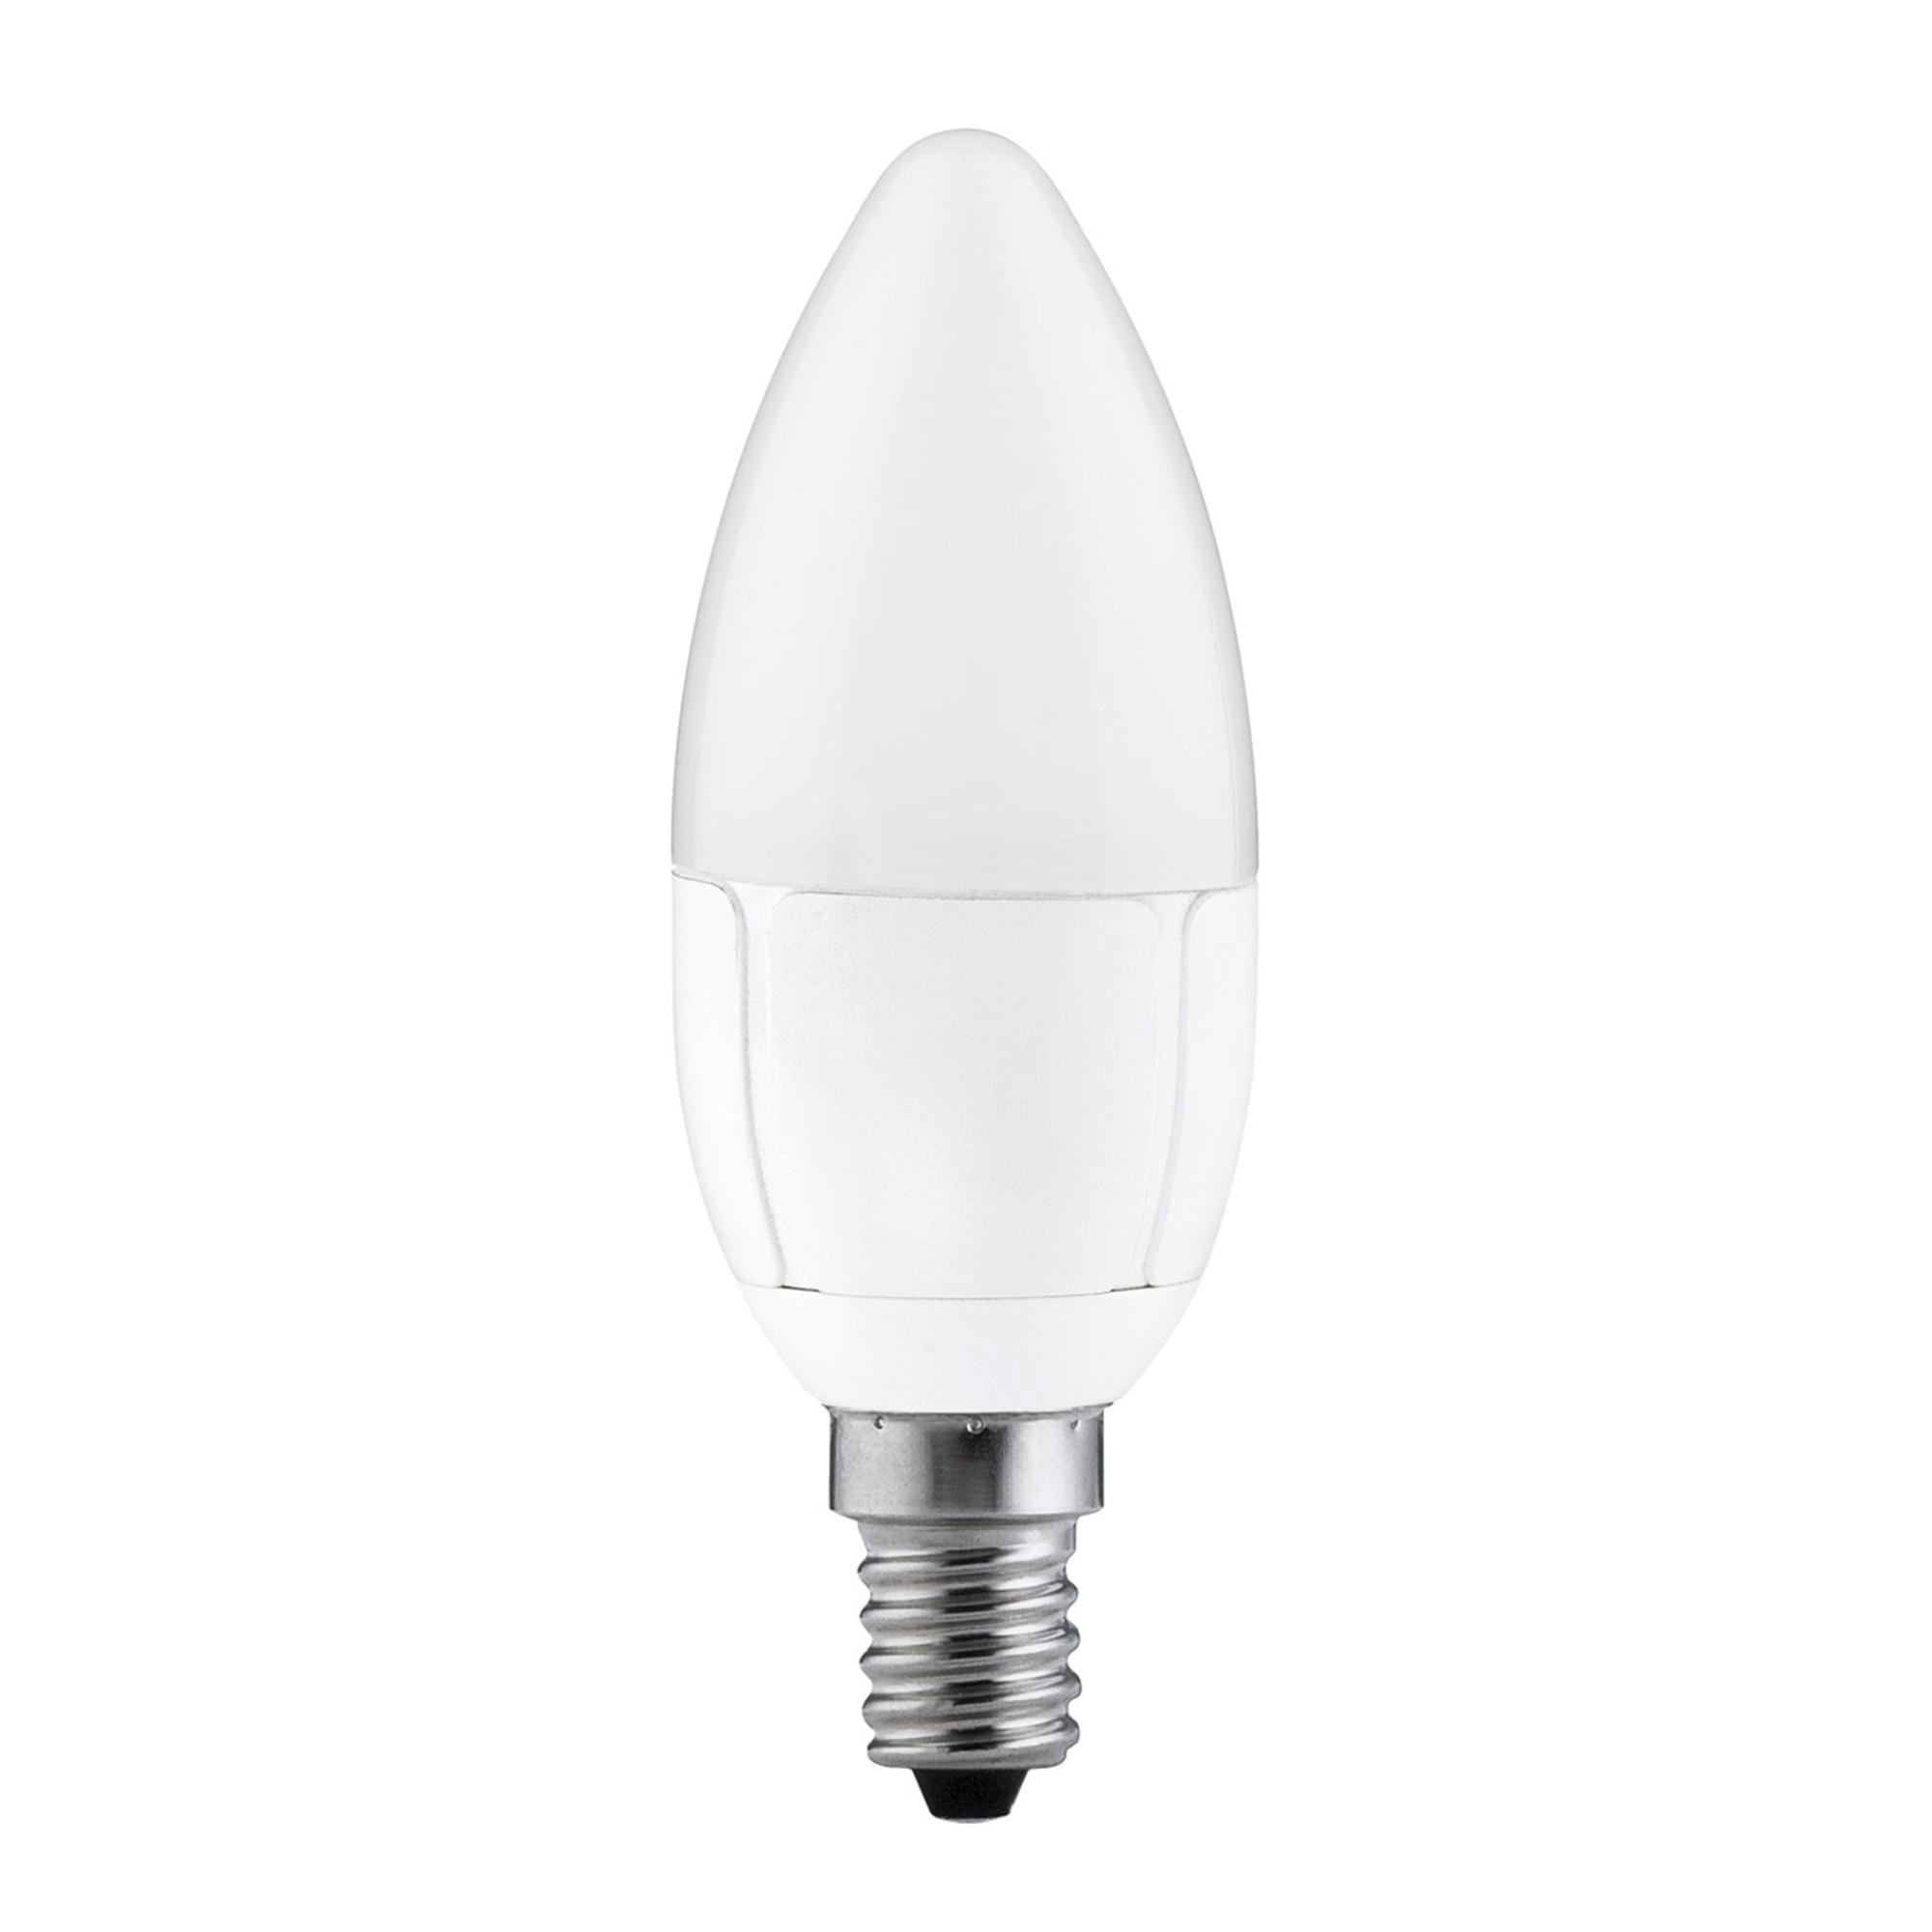 Лампа светодиодная Paulmann 28147 E14 300 Лм теплый свет